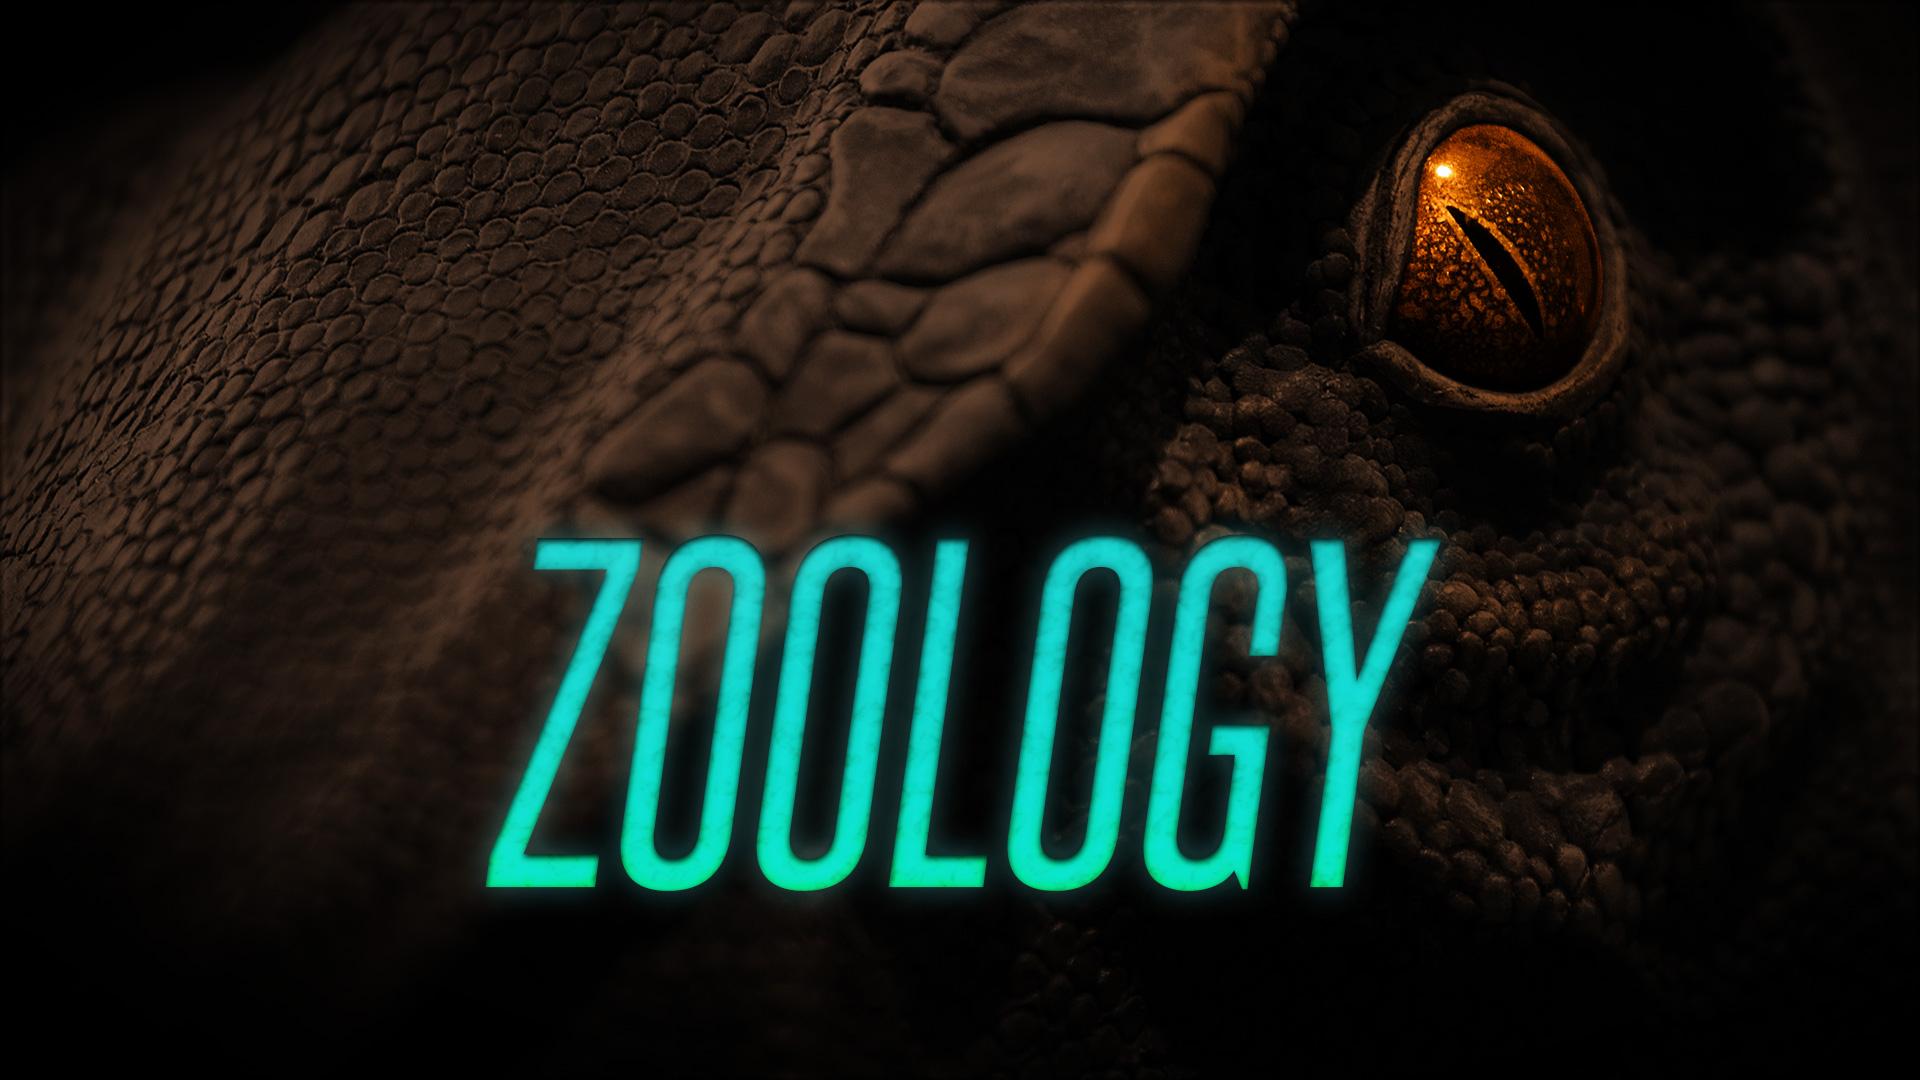 Steam Workshop Karas Zoology Server 1920x1080